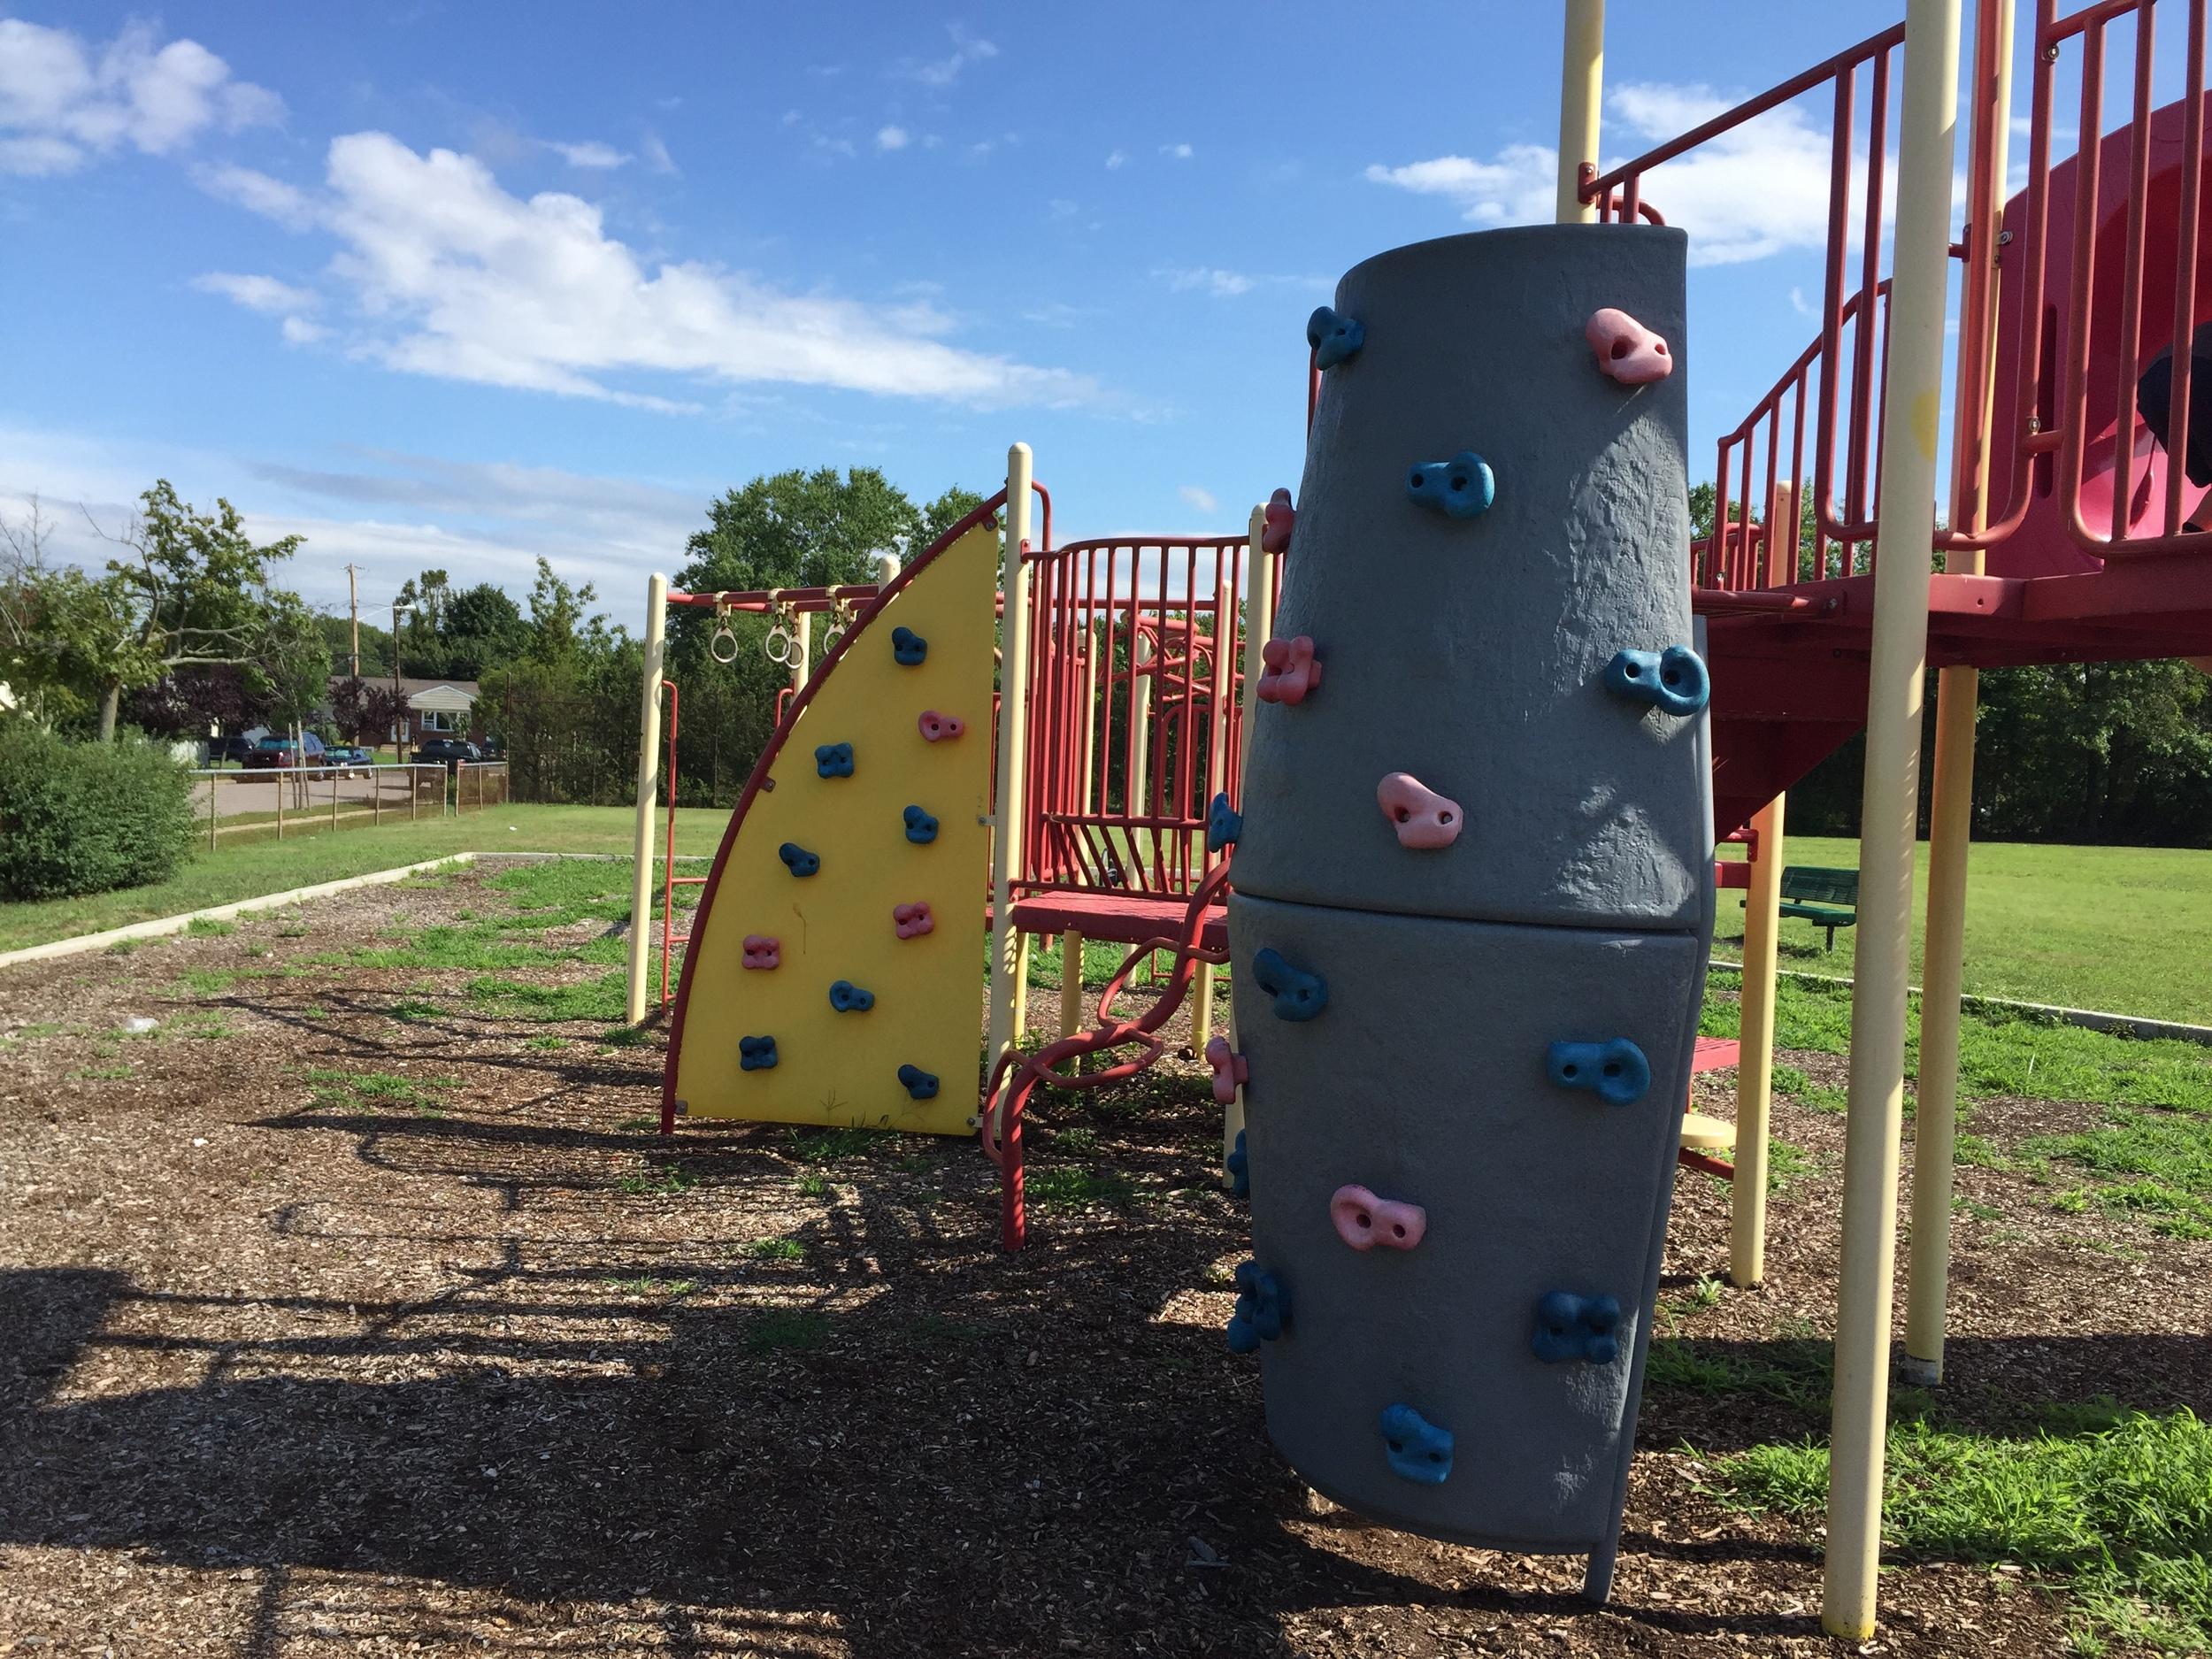 Rock Climb at Rose St Playground